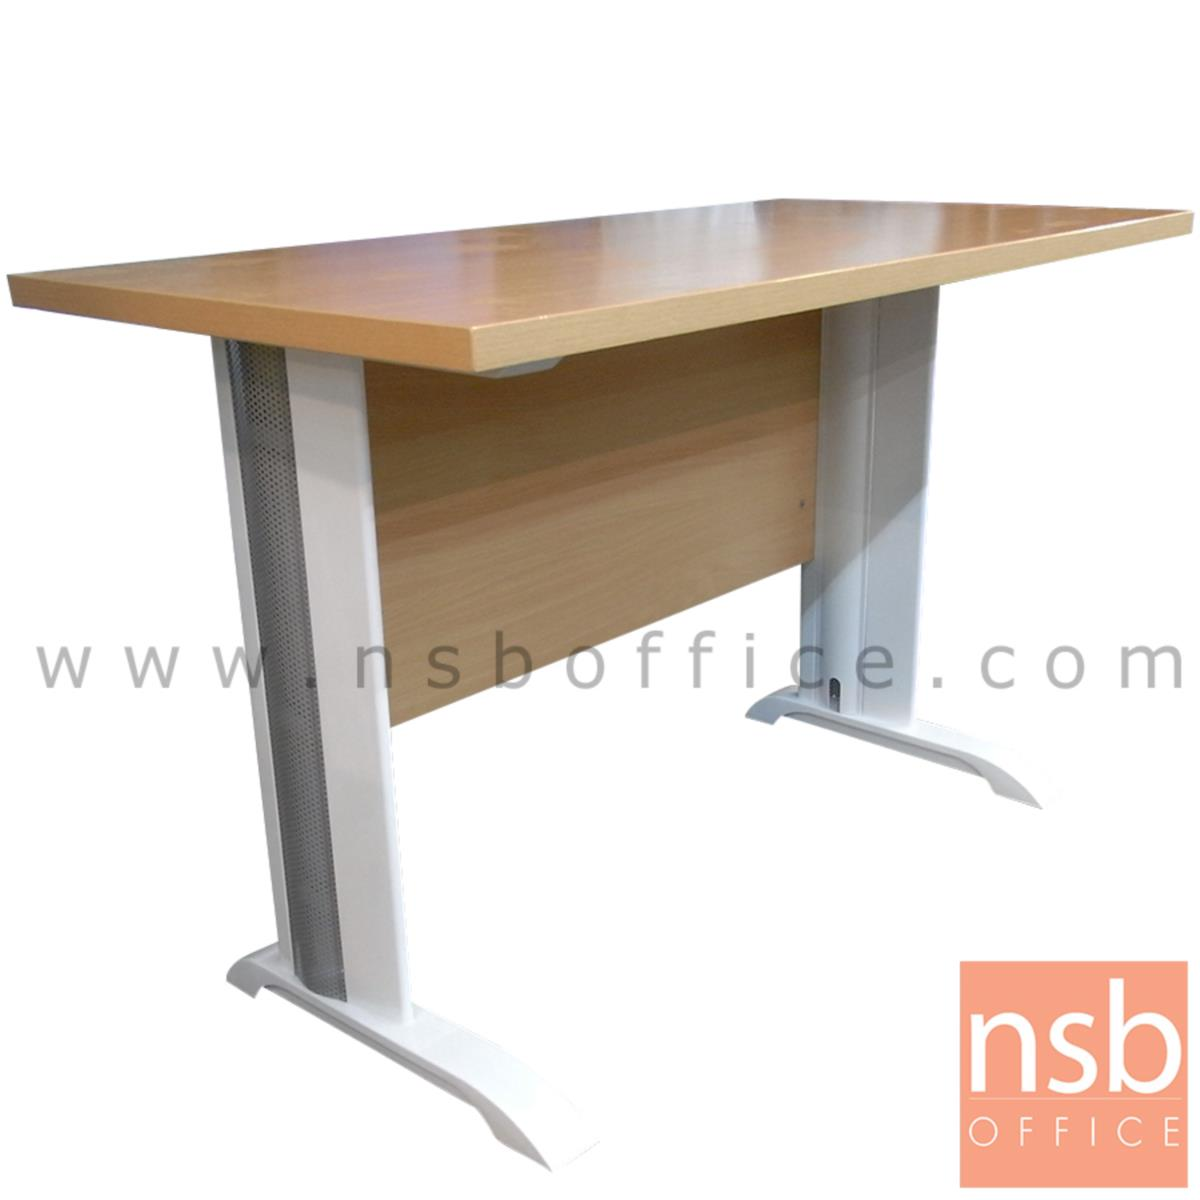 A18A012:โต๊ะทำงาน รุ่น Knightshayes (ไนท์เฮย์ส) ขนาด 120W ,135W ,150W ,160W ,180W (60D, 75D, 80D) cm.  เมลามีน